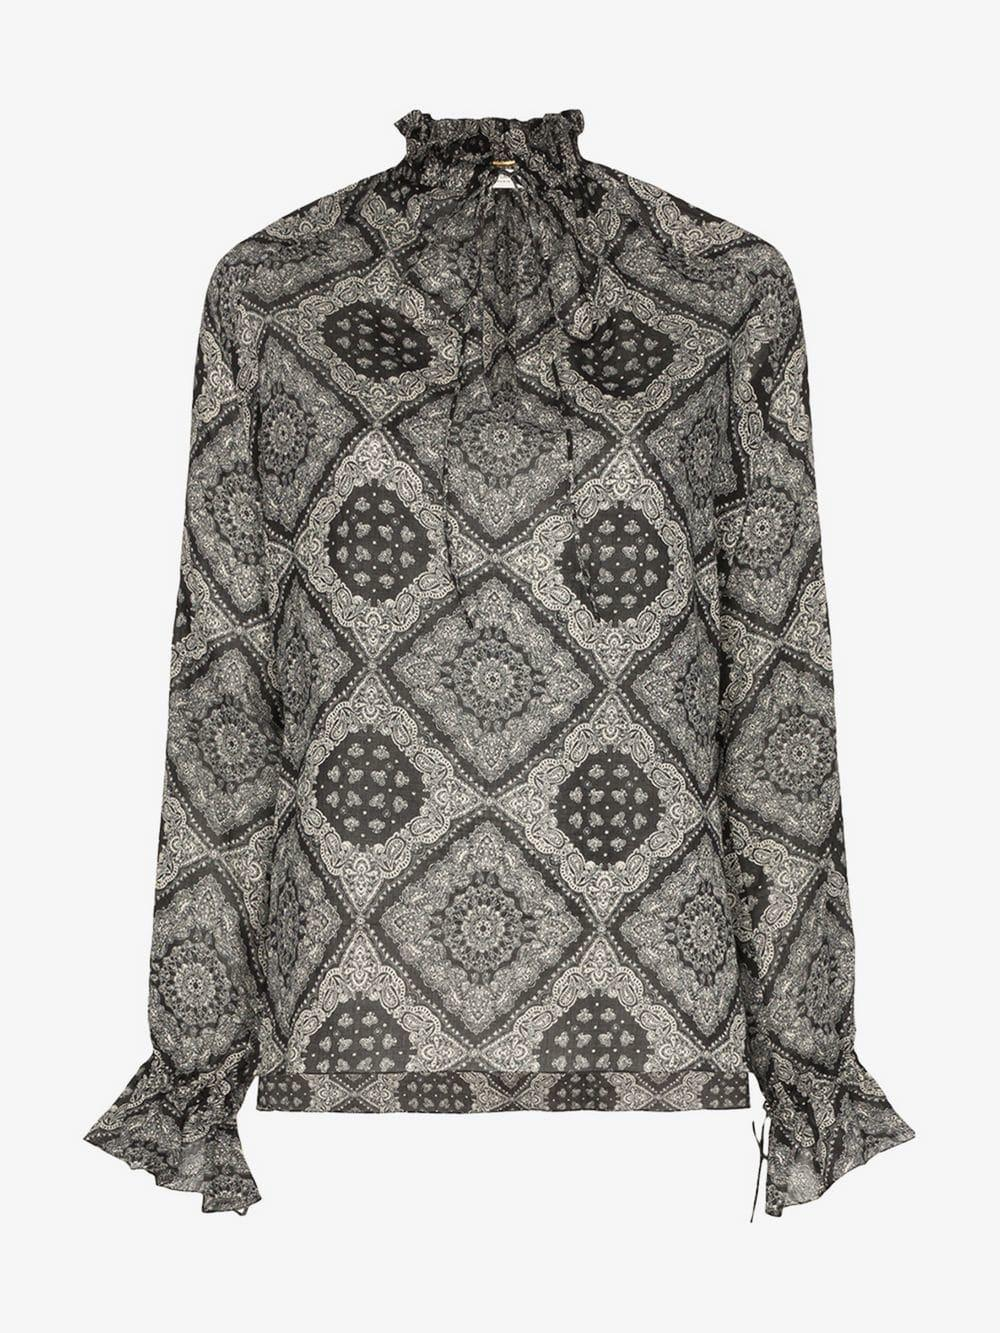 9003aeed2da093 Lyst - Saint Laurent Bandana Print Tie Neck Blouse in Black - Save 15%